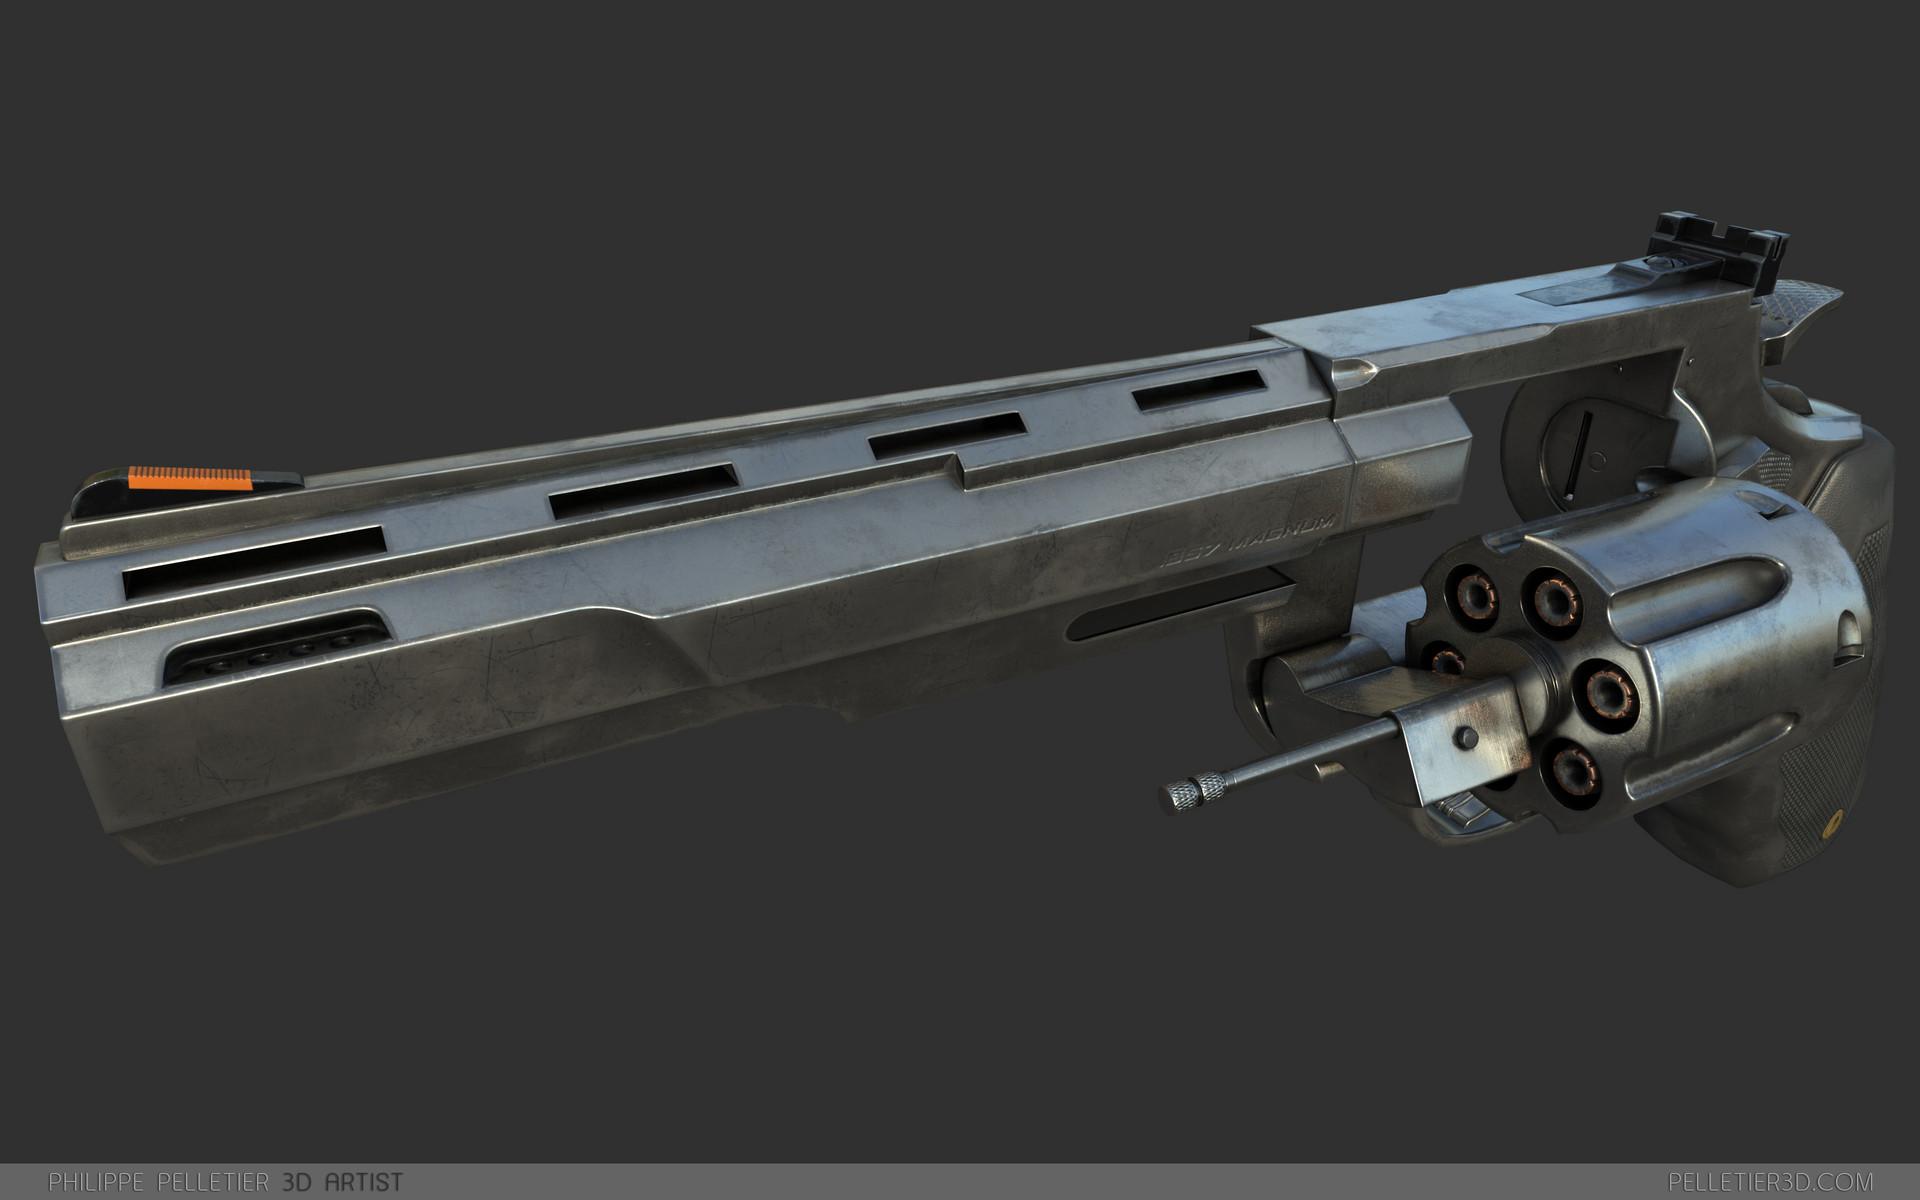 Philippe pelletier revolver 007